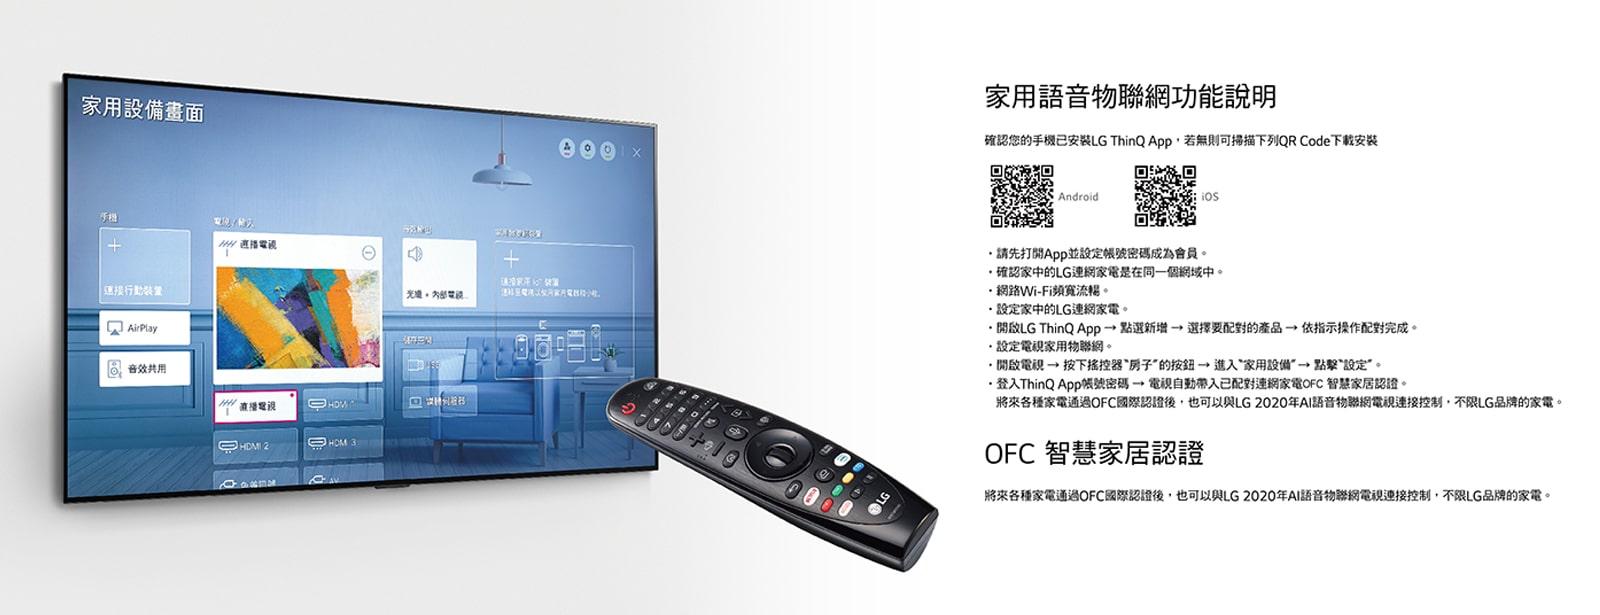 2020-OLED-TV_Leaflet_cover-18_FA_0430_ol_P13-14-D